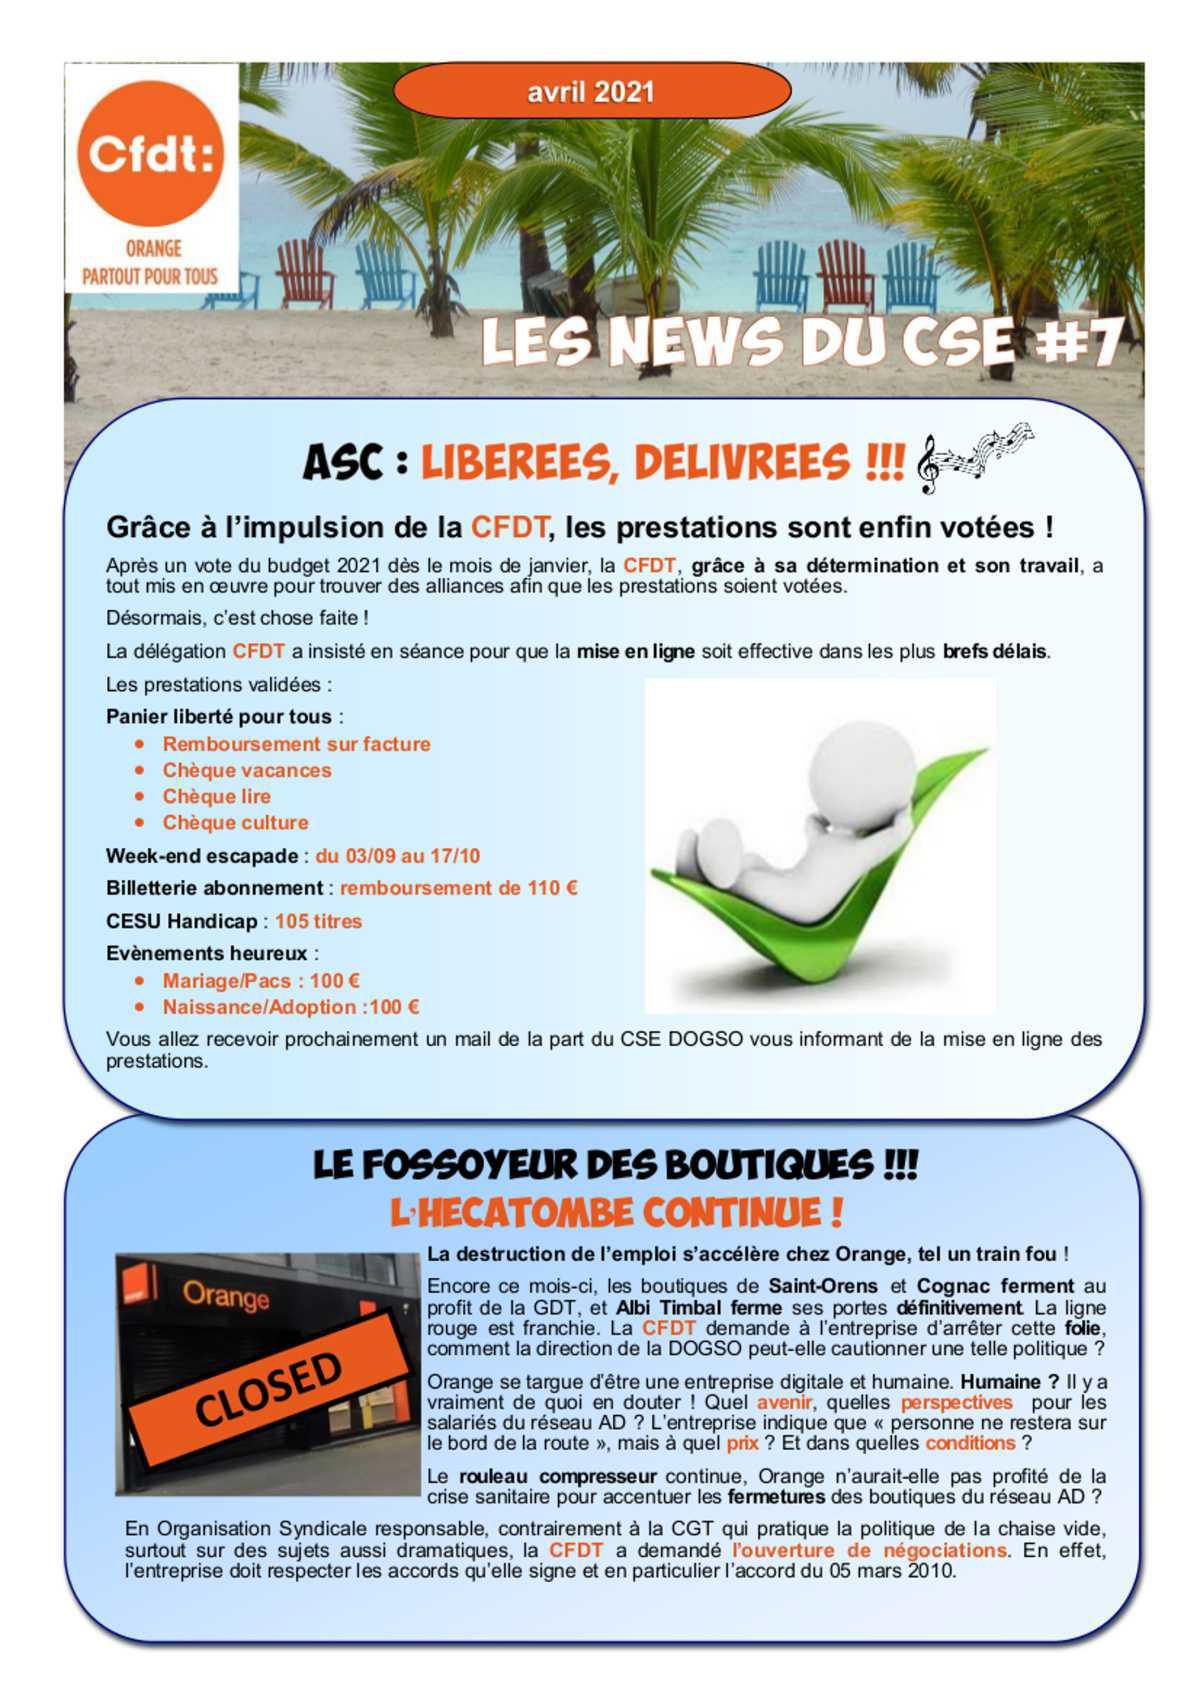 Les News du CSE N°7 - Avril 2021